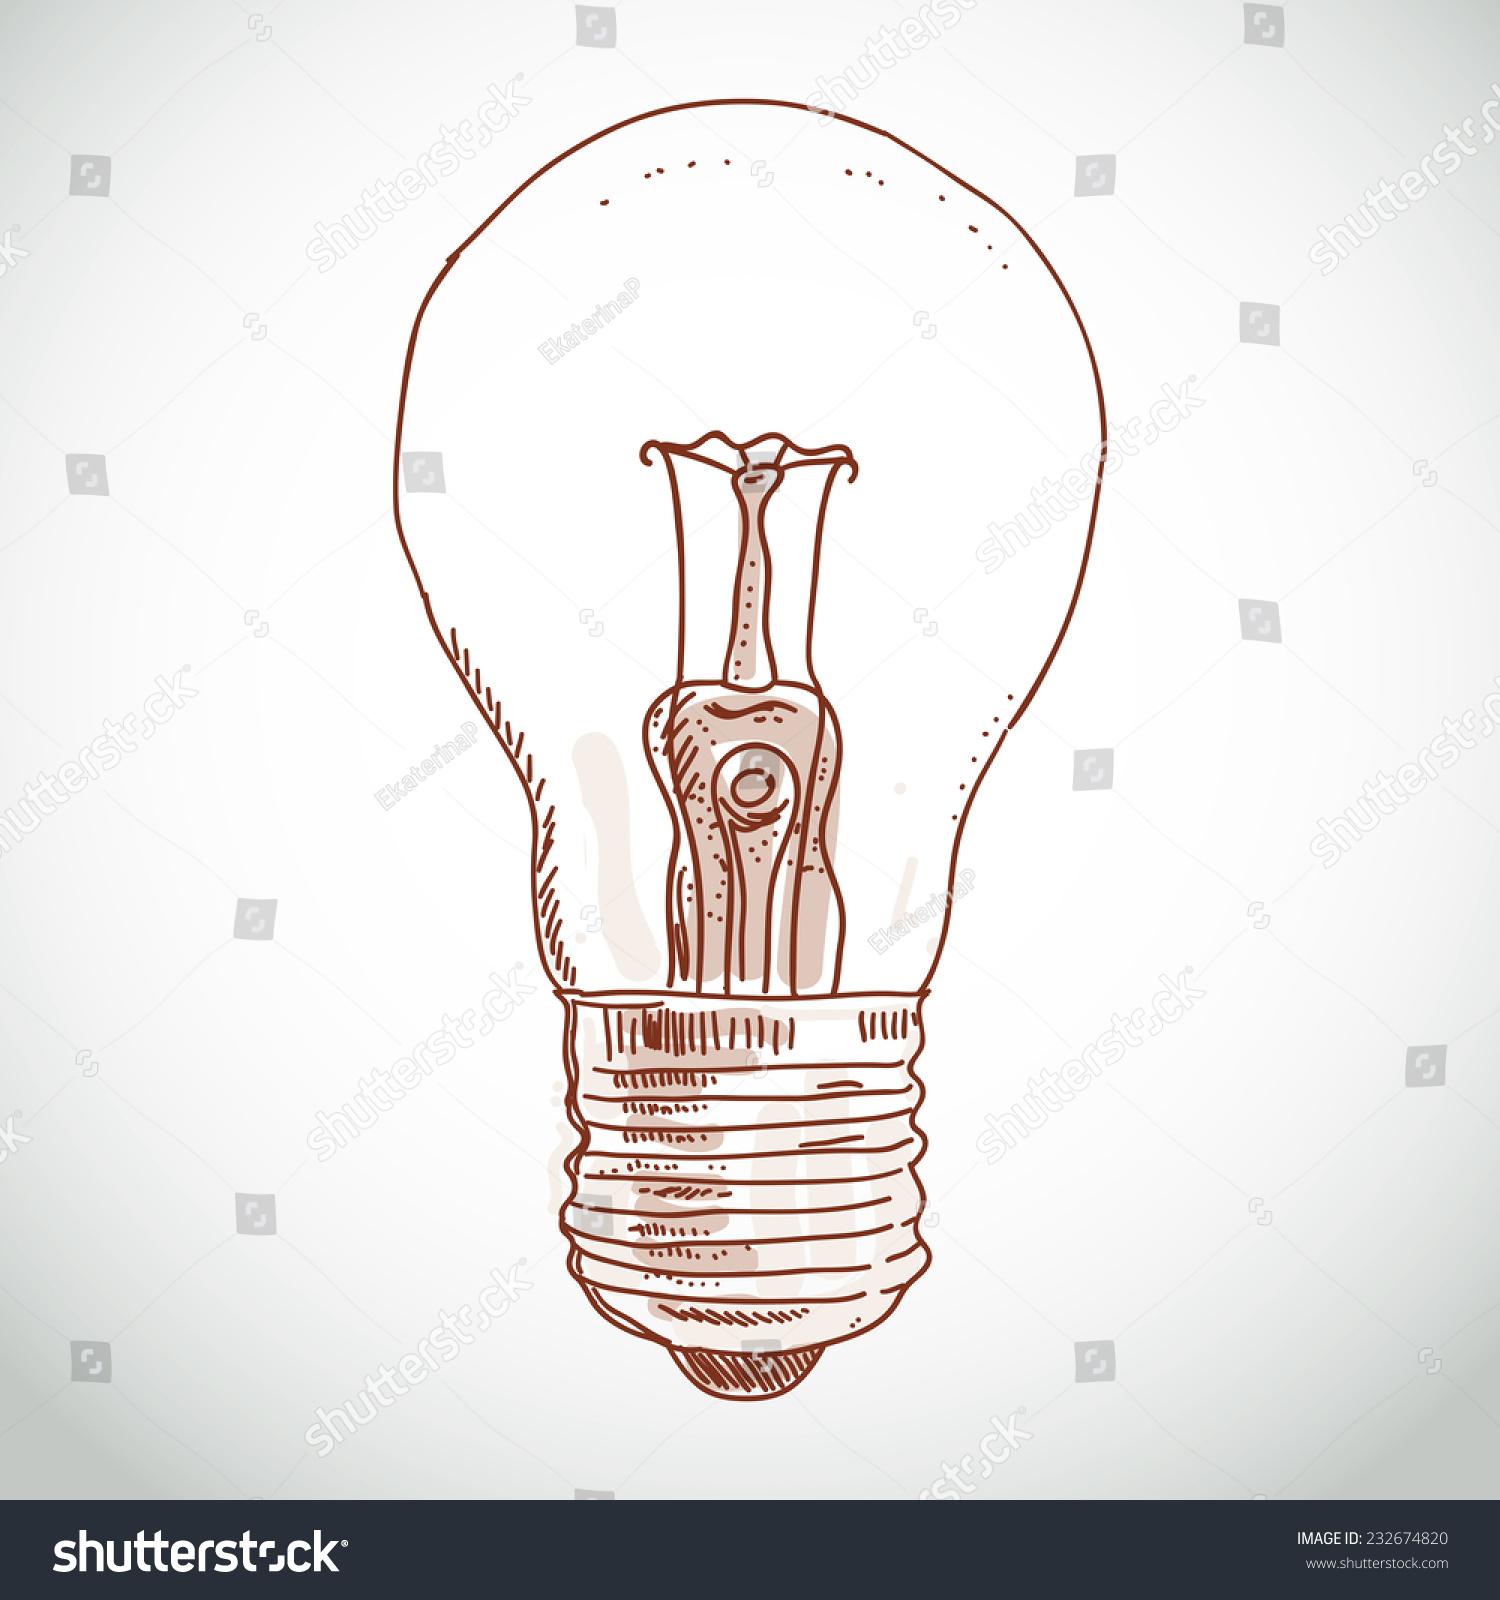 Idea Lightbulb Sketch On White Background Stock Vector (Royalty Free ...